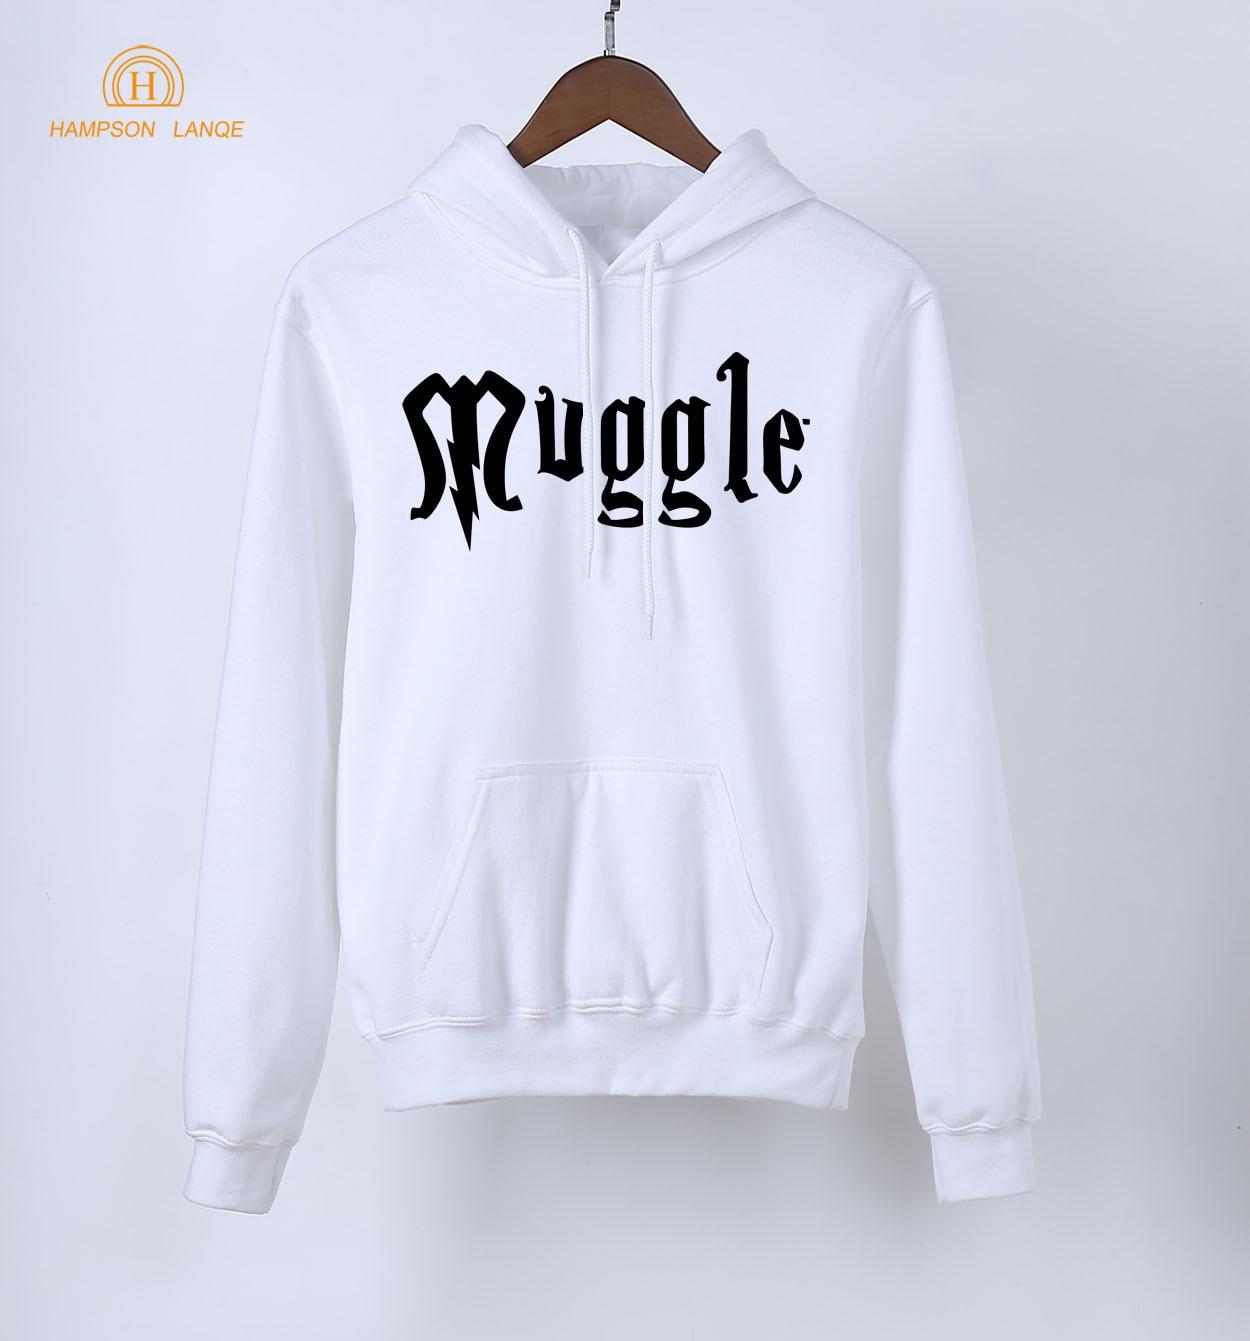 Hogwarts Muggle Women's Hoodies 2019 Hot Sale Adult Spring Autumn Kawaii Sweatshirts Women K-pop Hoodie Fleece Casual Pullovers